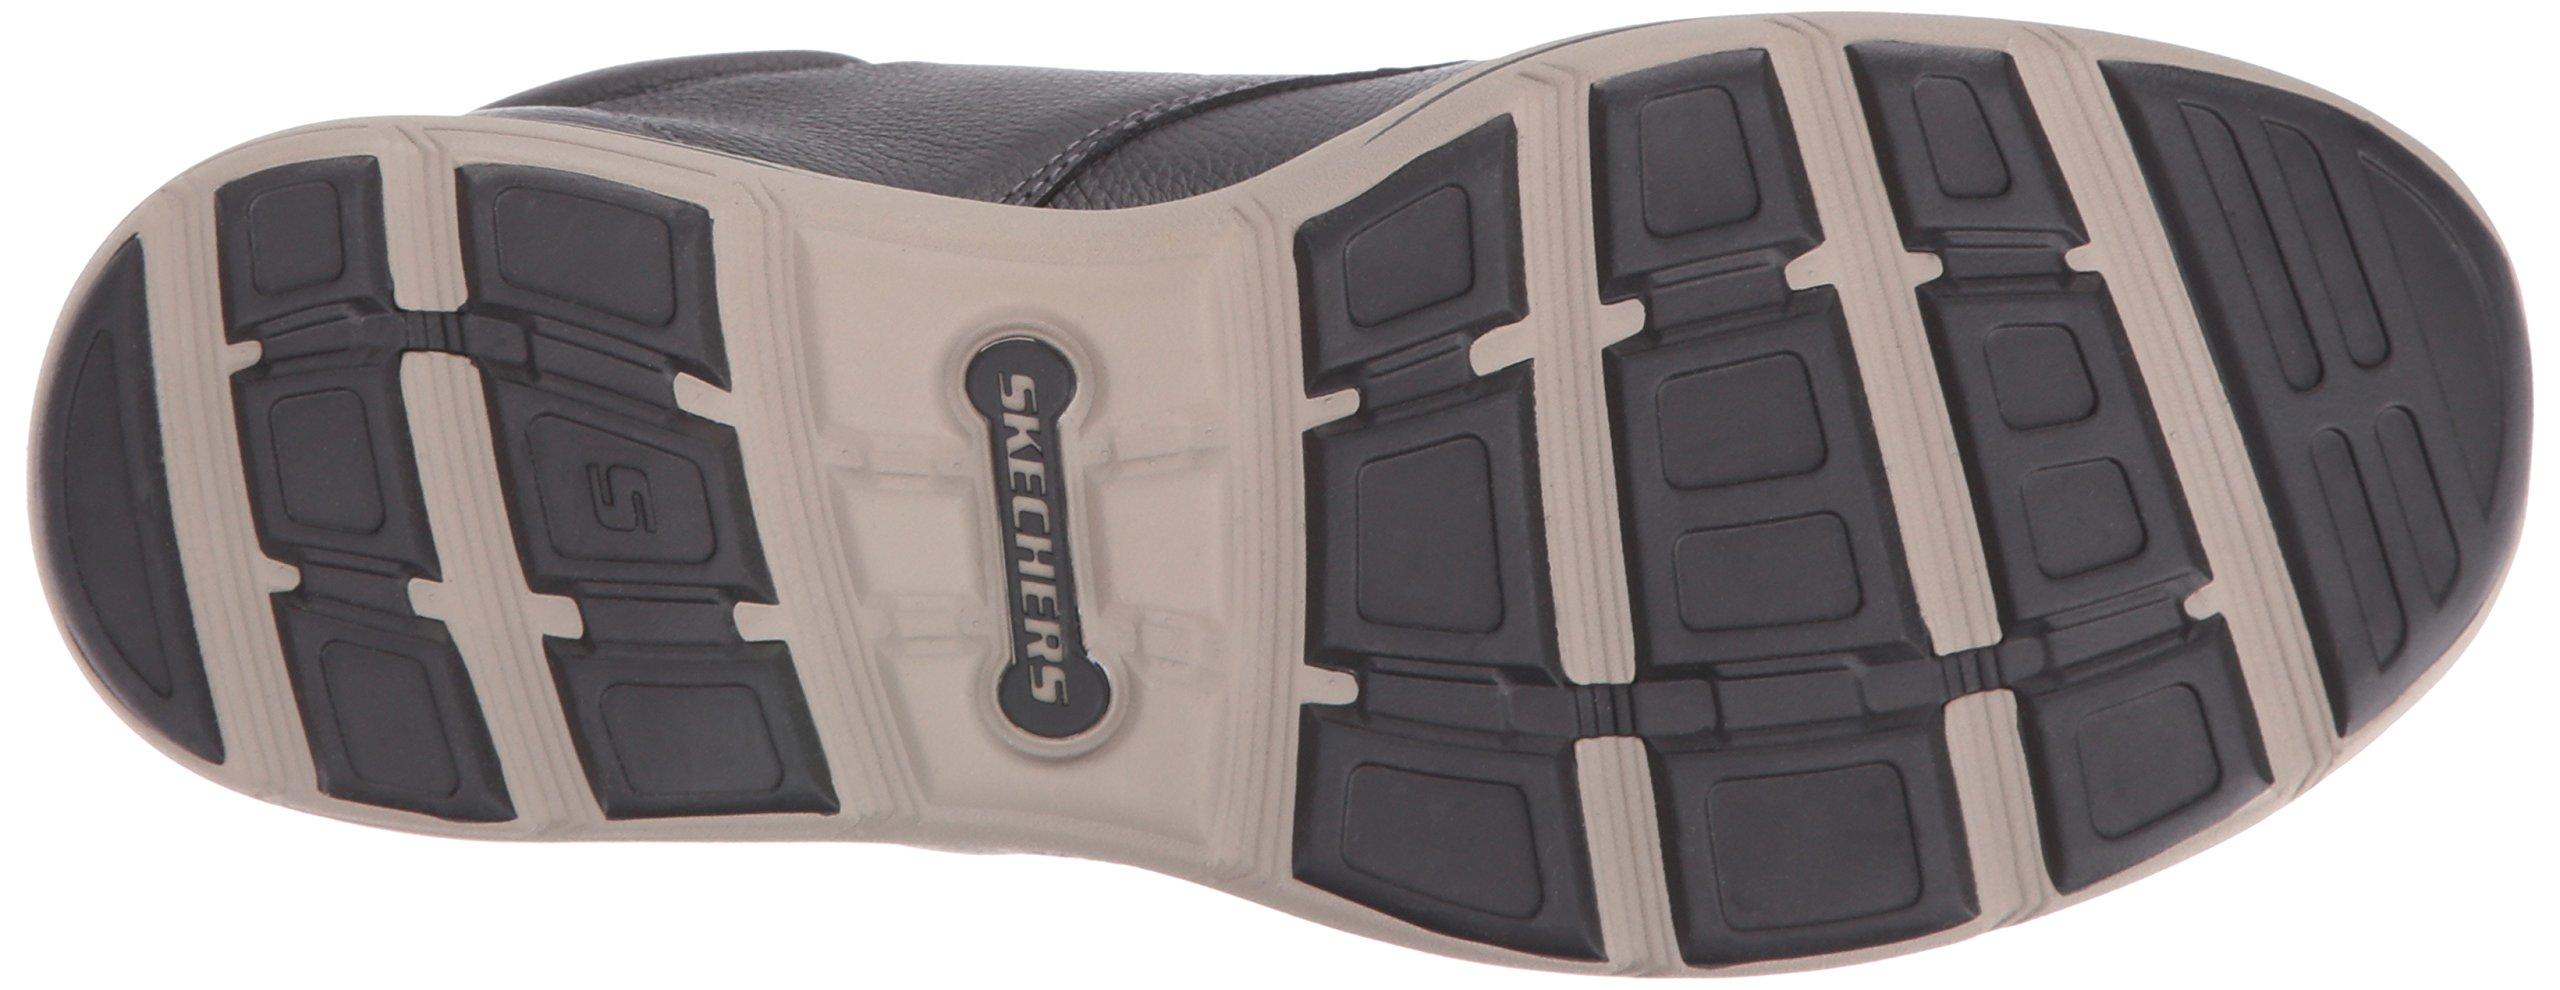 multiple colors temperament shoes 2019 best sell Details about Skechers USA Men's Harper Meldon Chukka Boot,Black - Choose  SZ/color